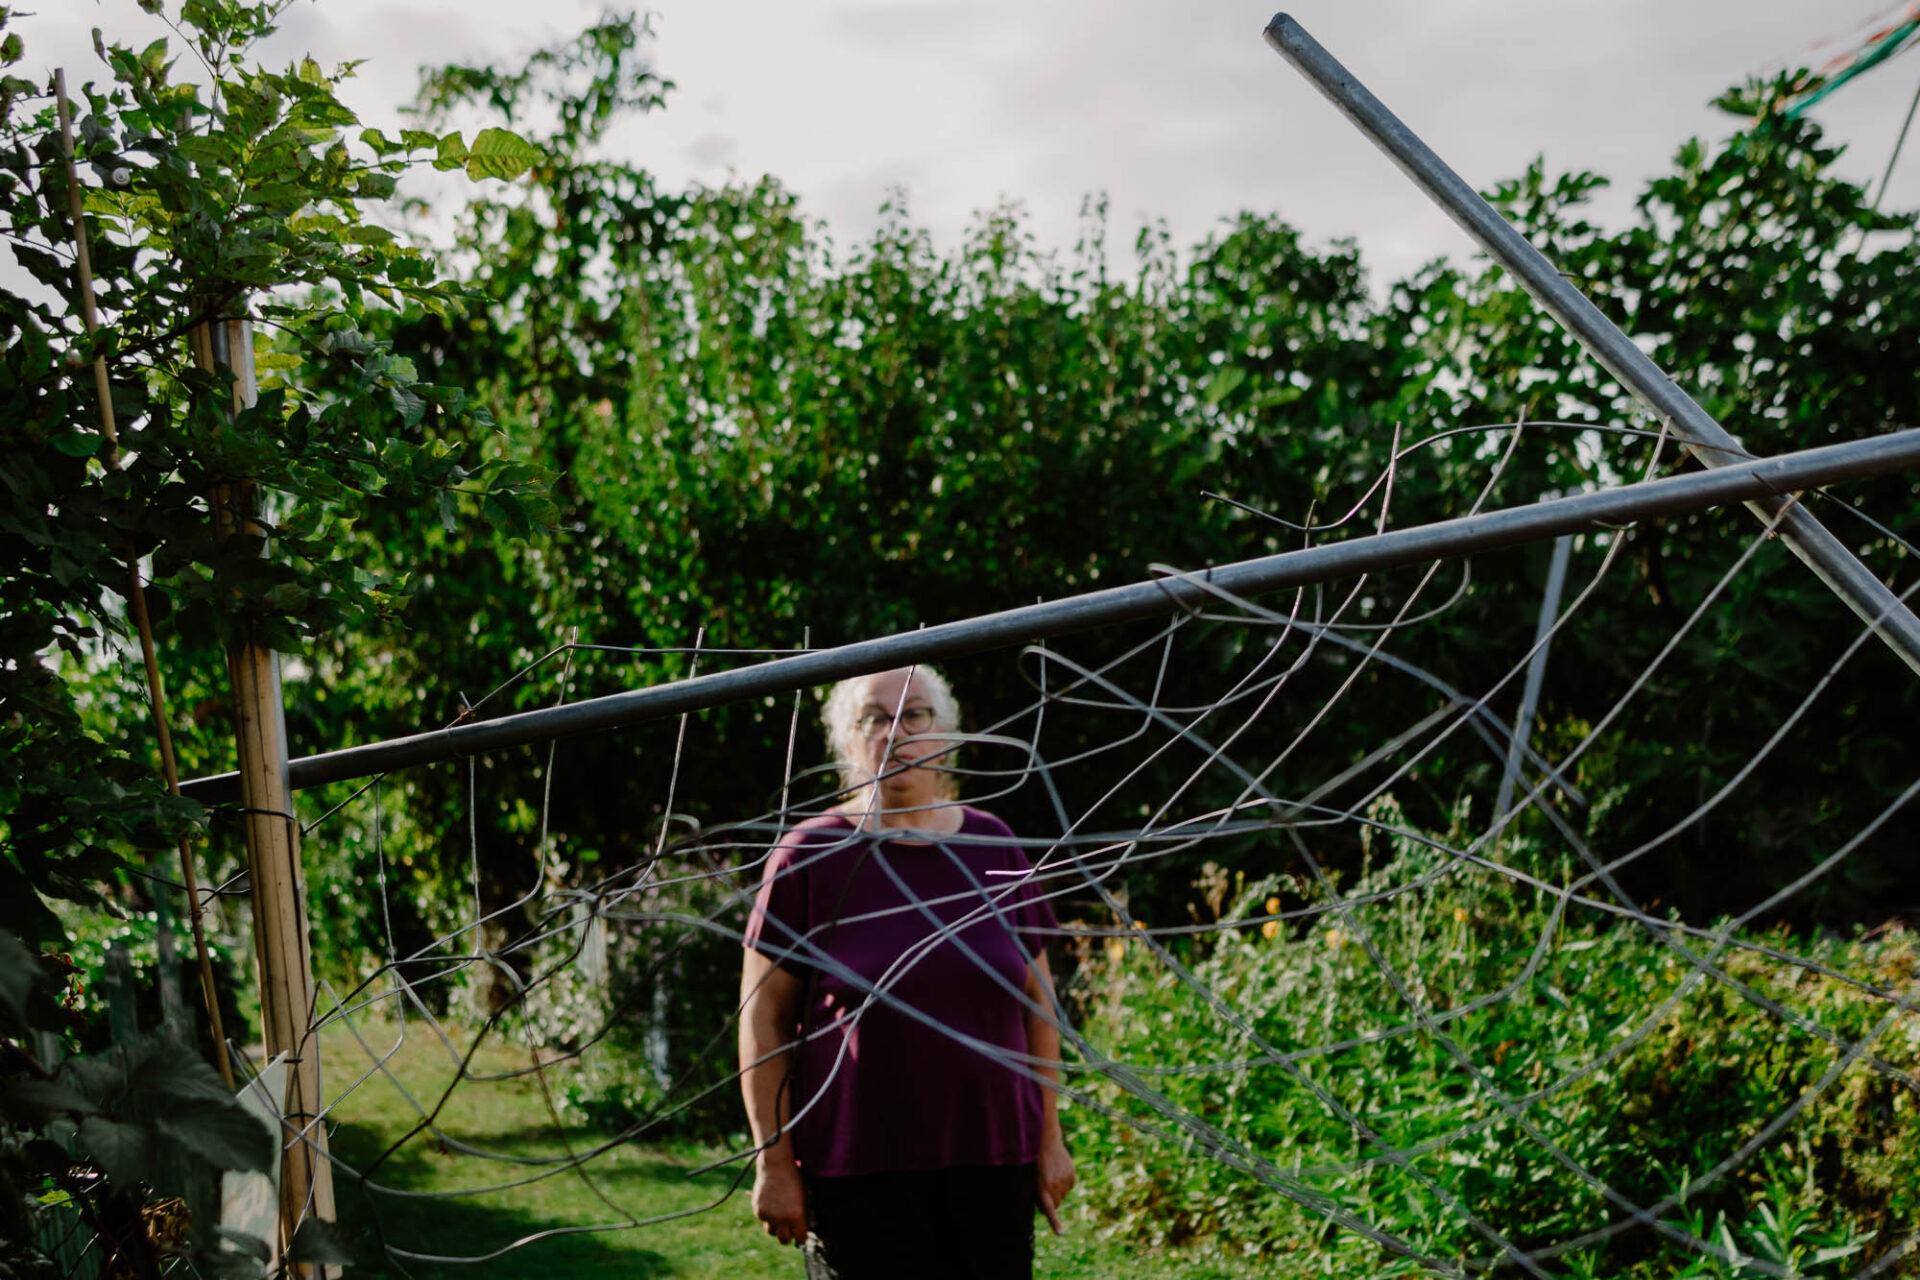 Jardins ouvriers aubervilliers 7 - Dagmara Bojenko - Eco-conscious Weddings, Births & Families